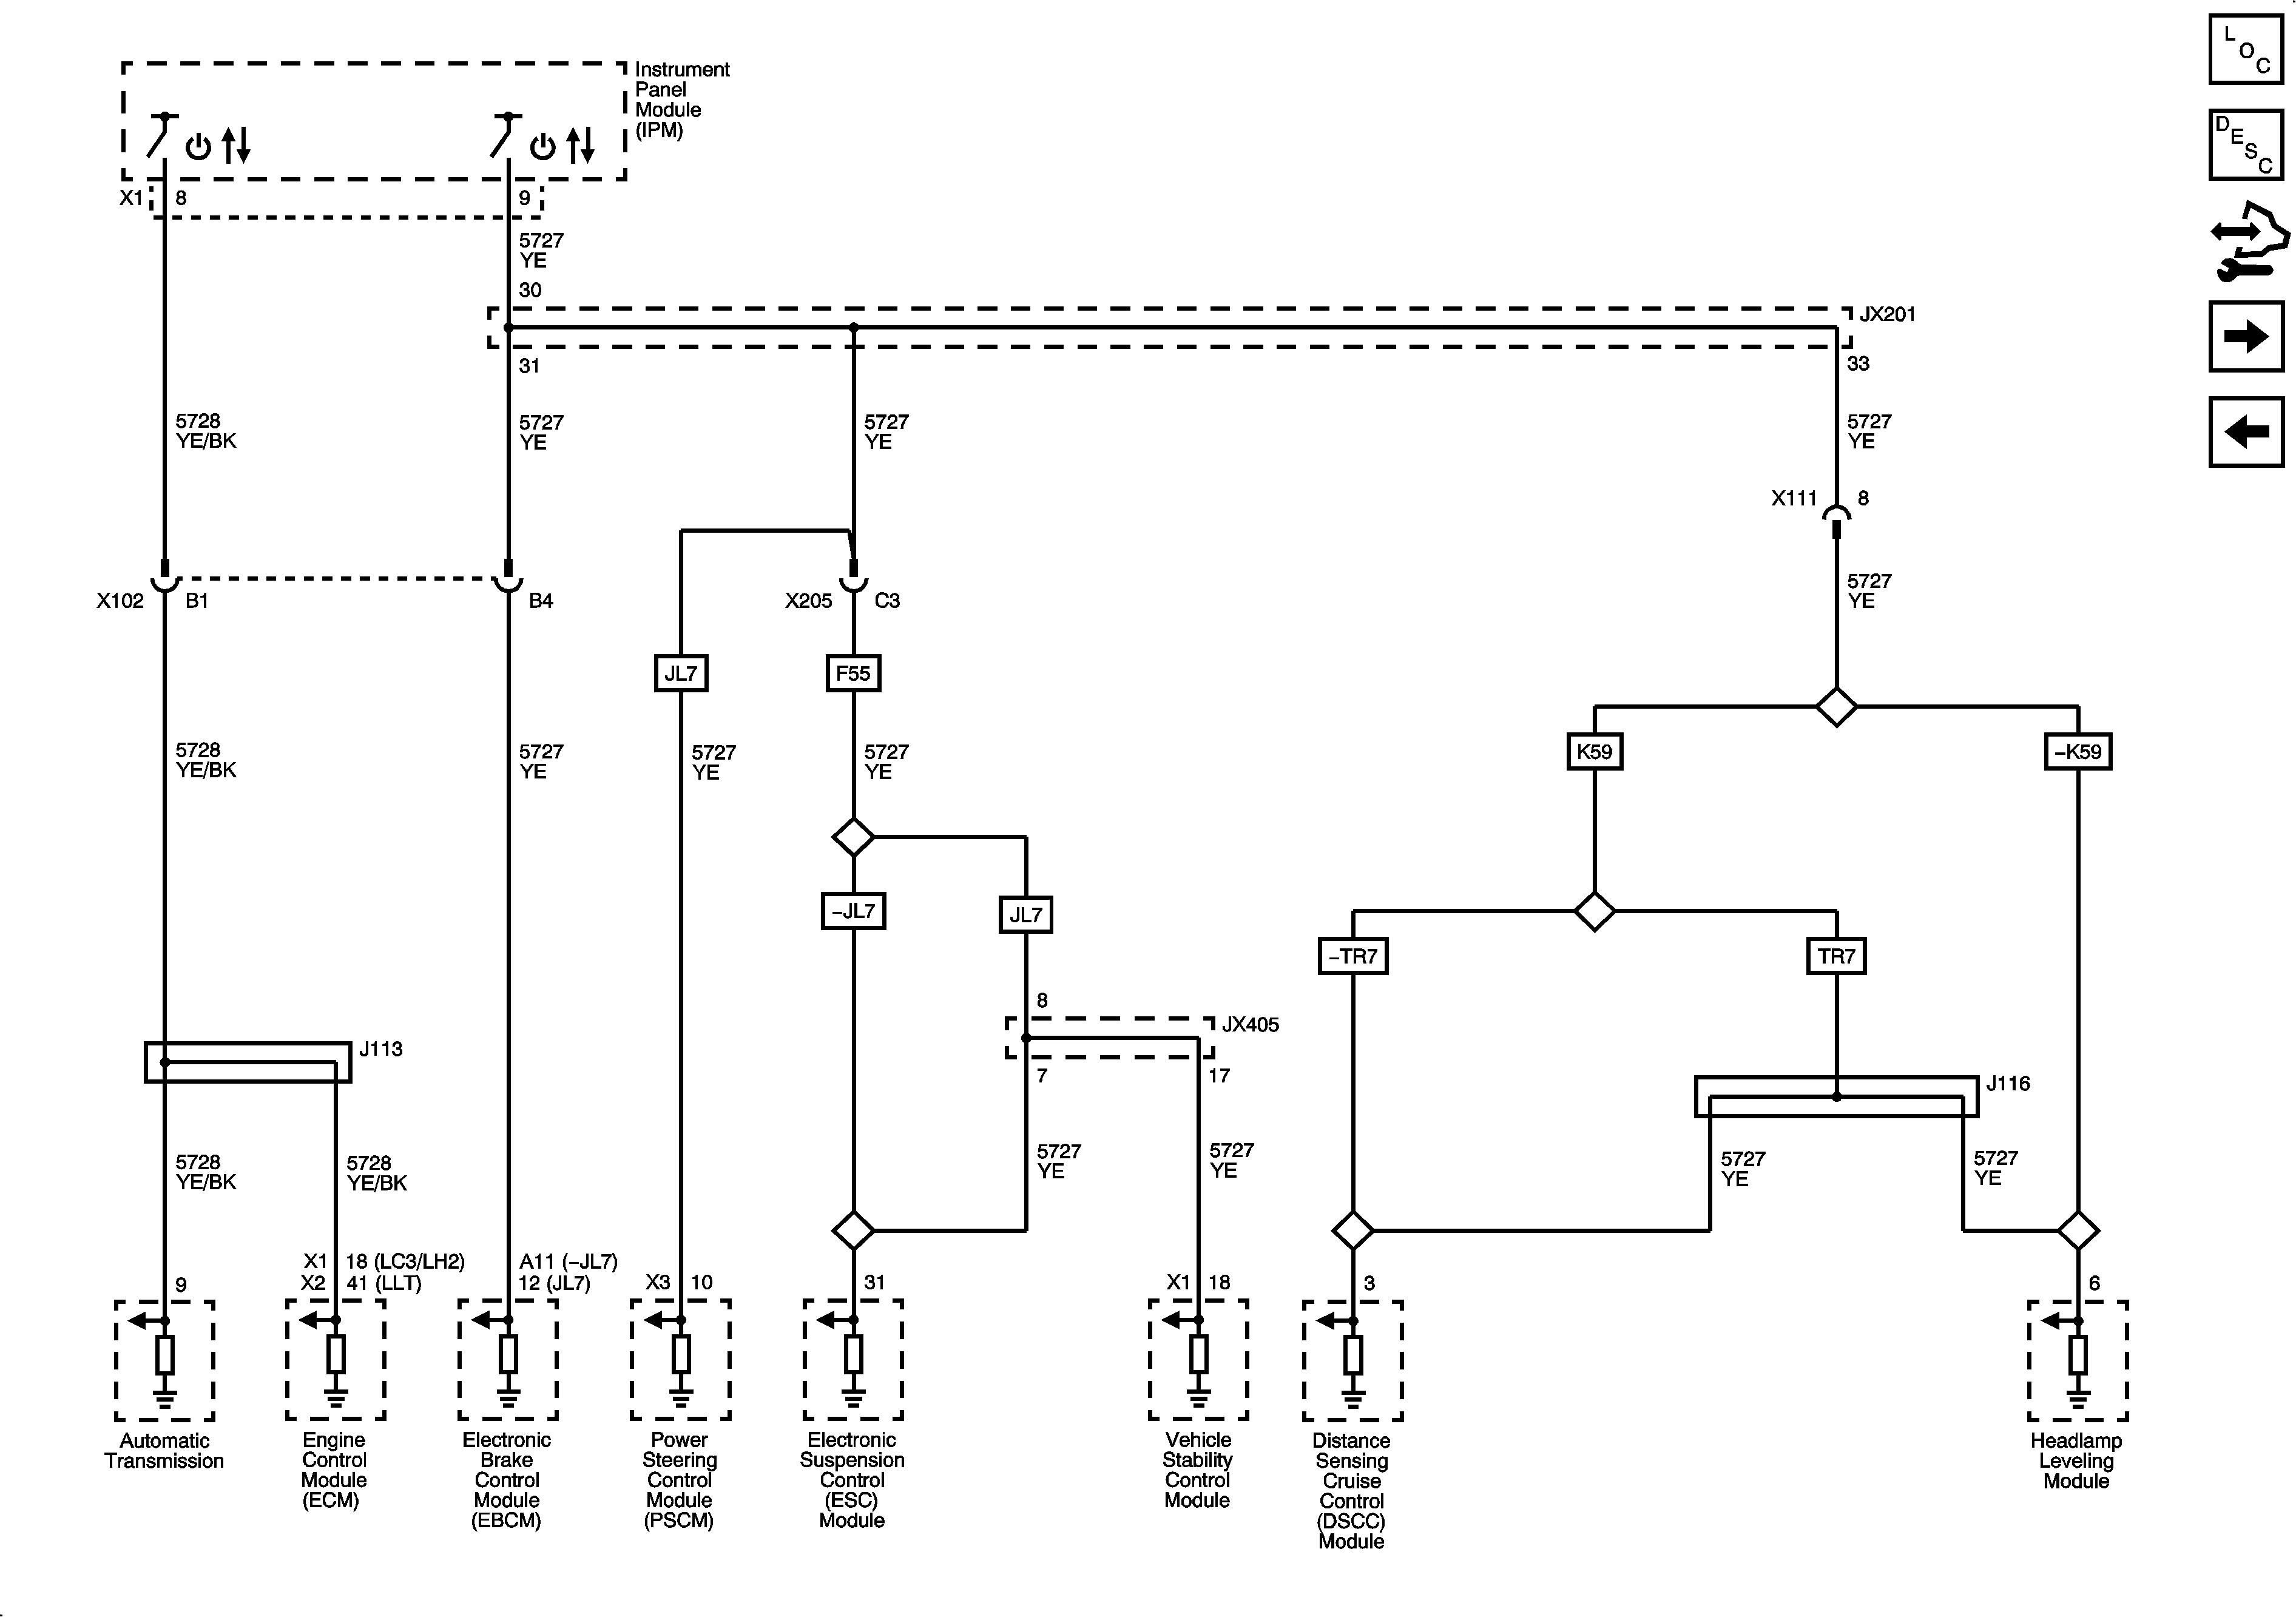 9ef2a506-f032-4b8d-b530-b38ceded6a30_1.png